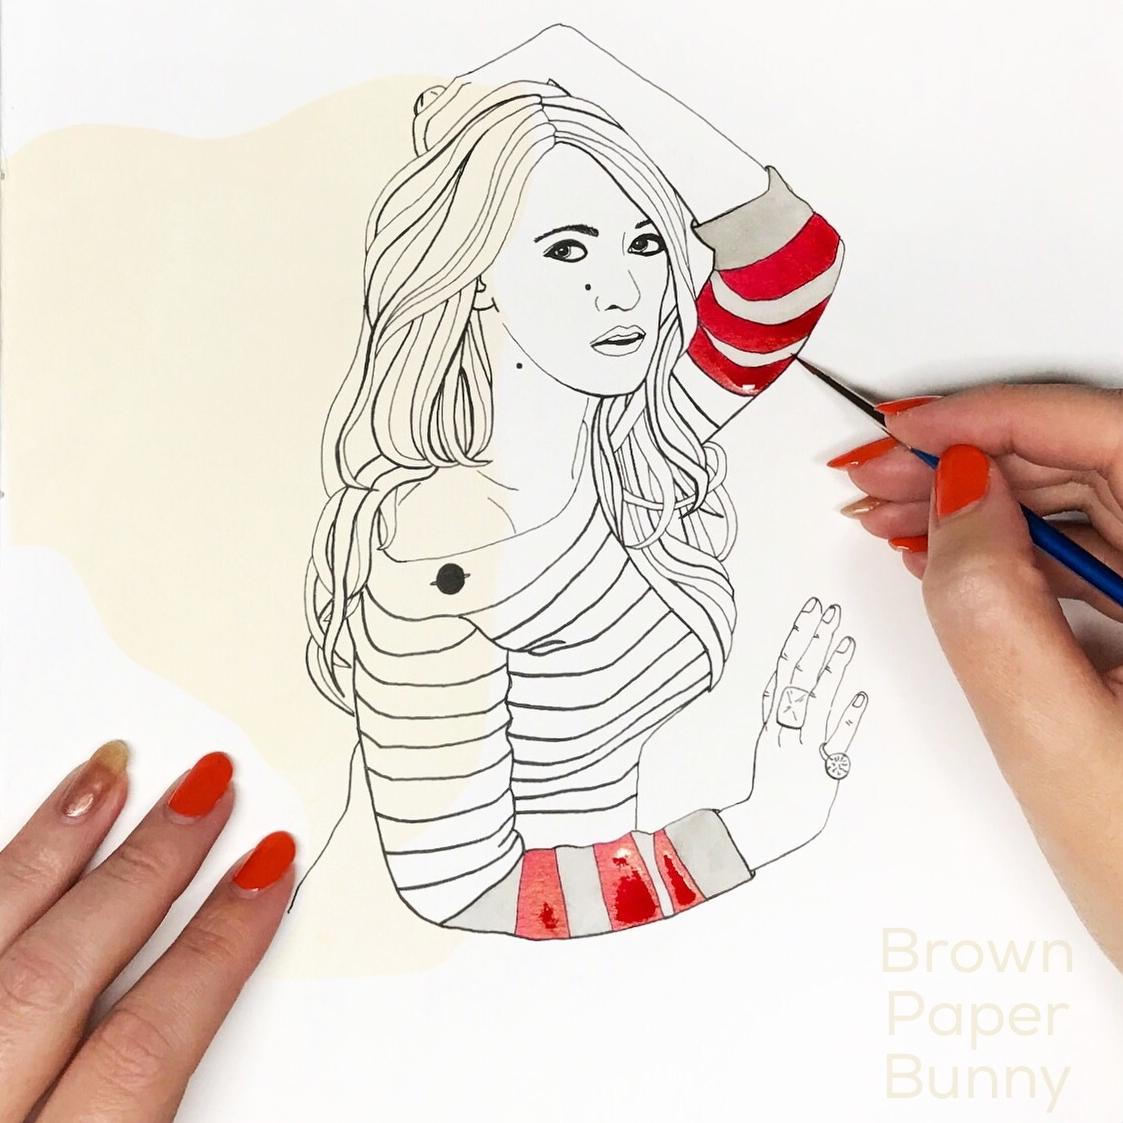 Custom-Fashion-Illustration-BrownPaperBunny-9.jpg